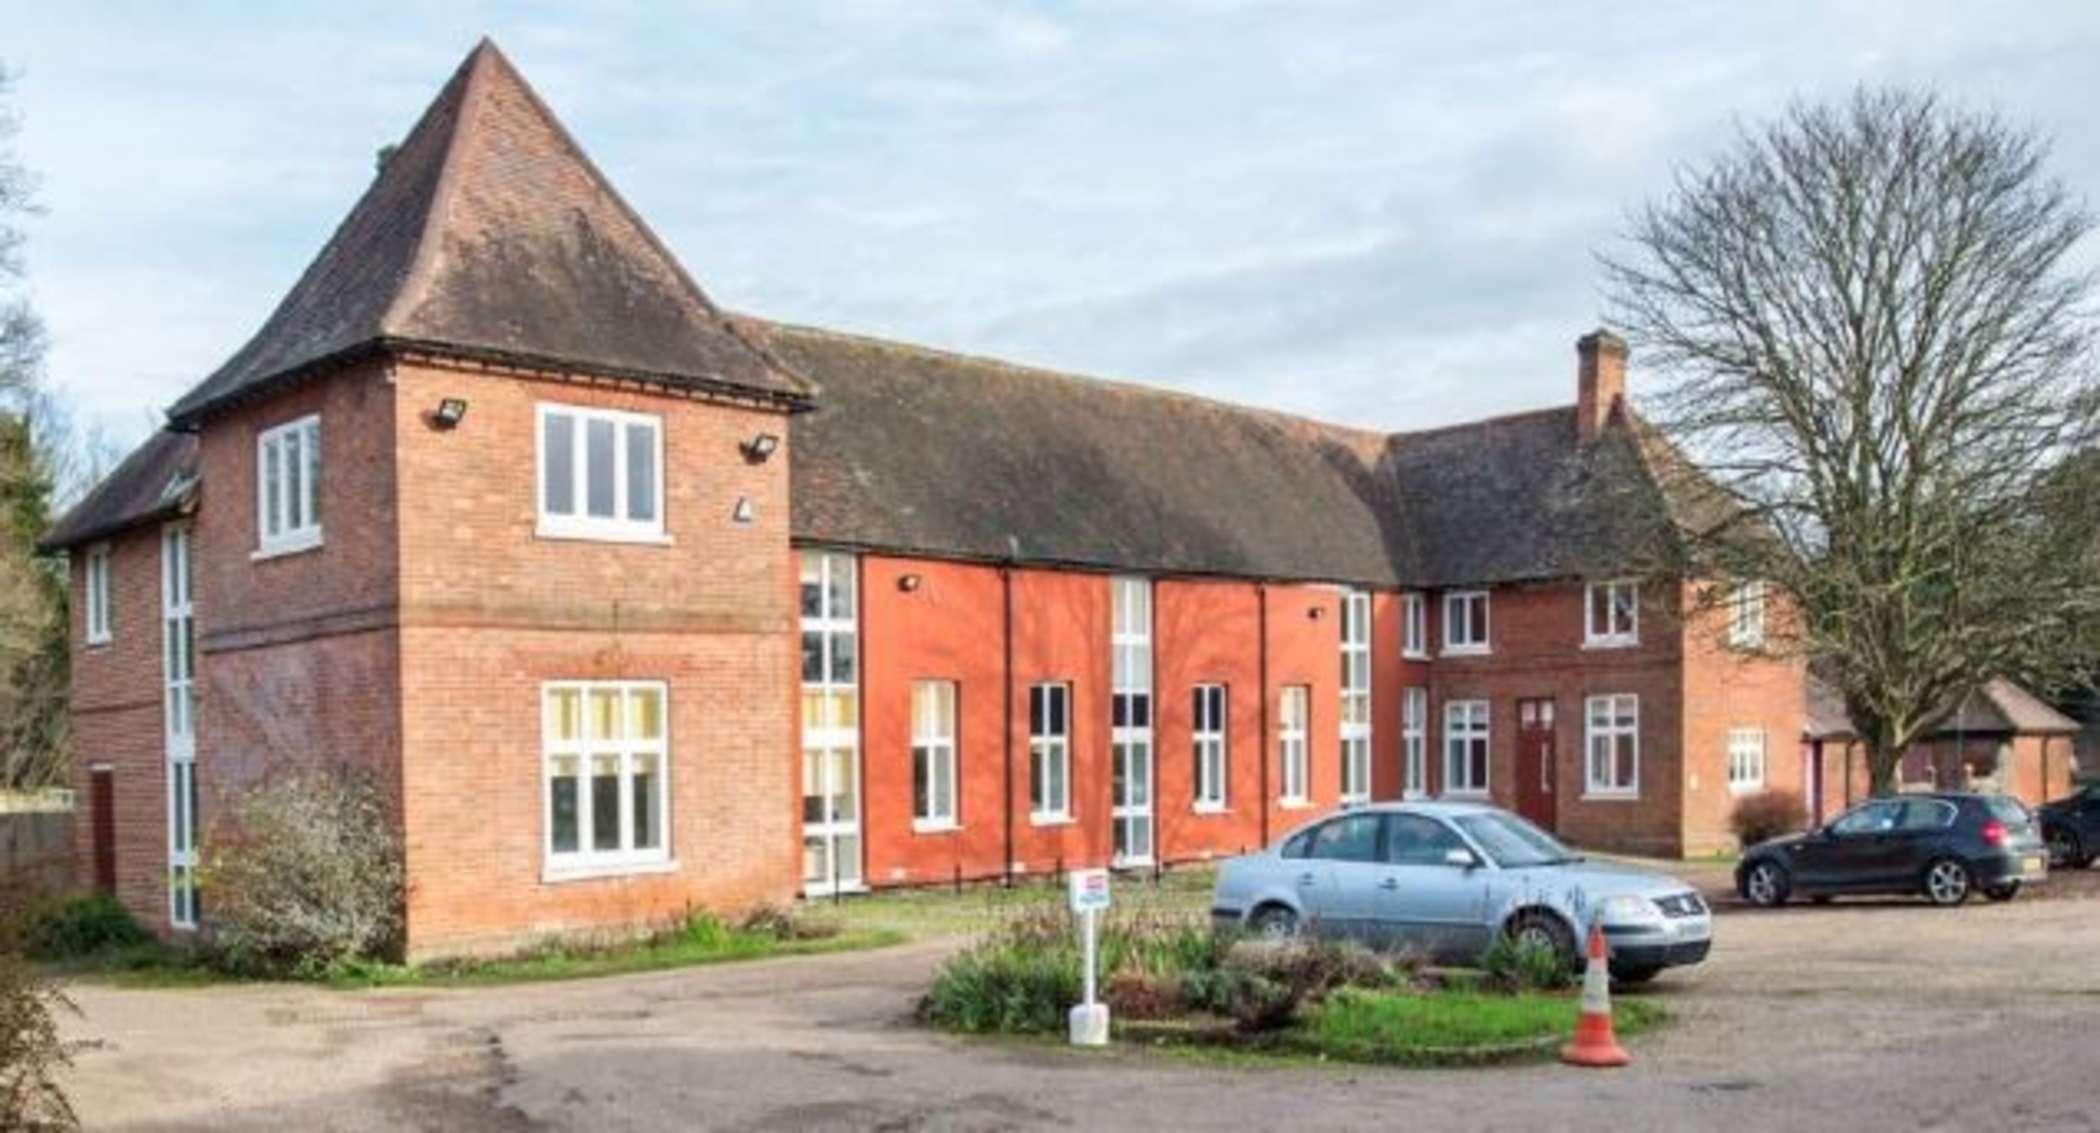 Property In St Albans Hertfordshire